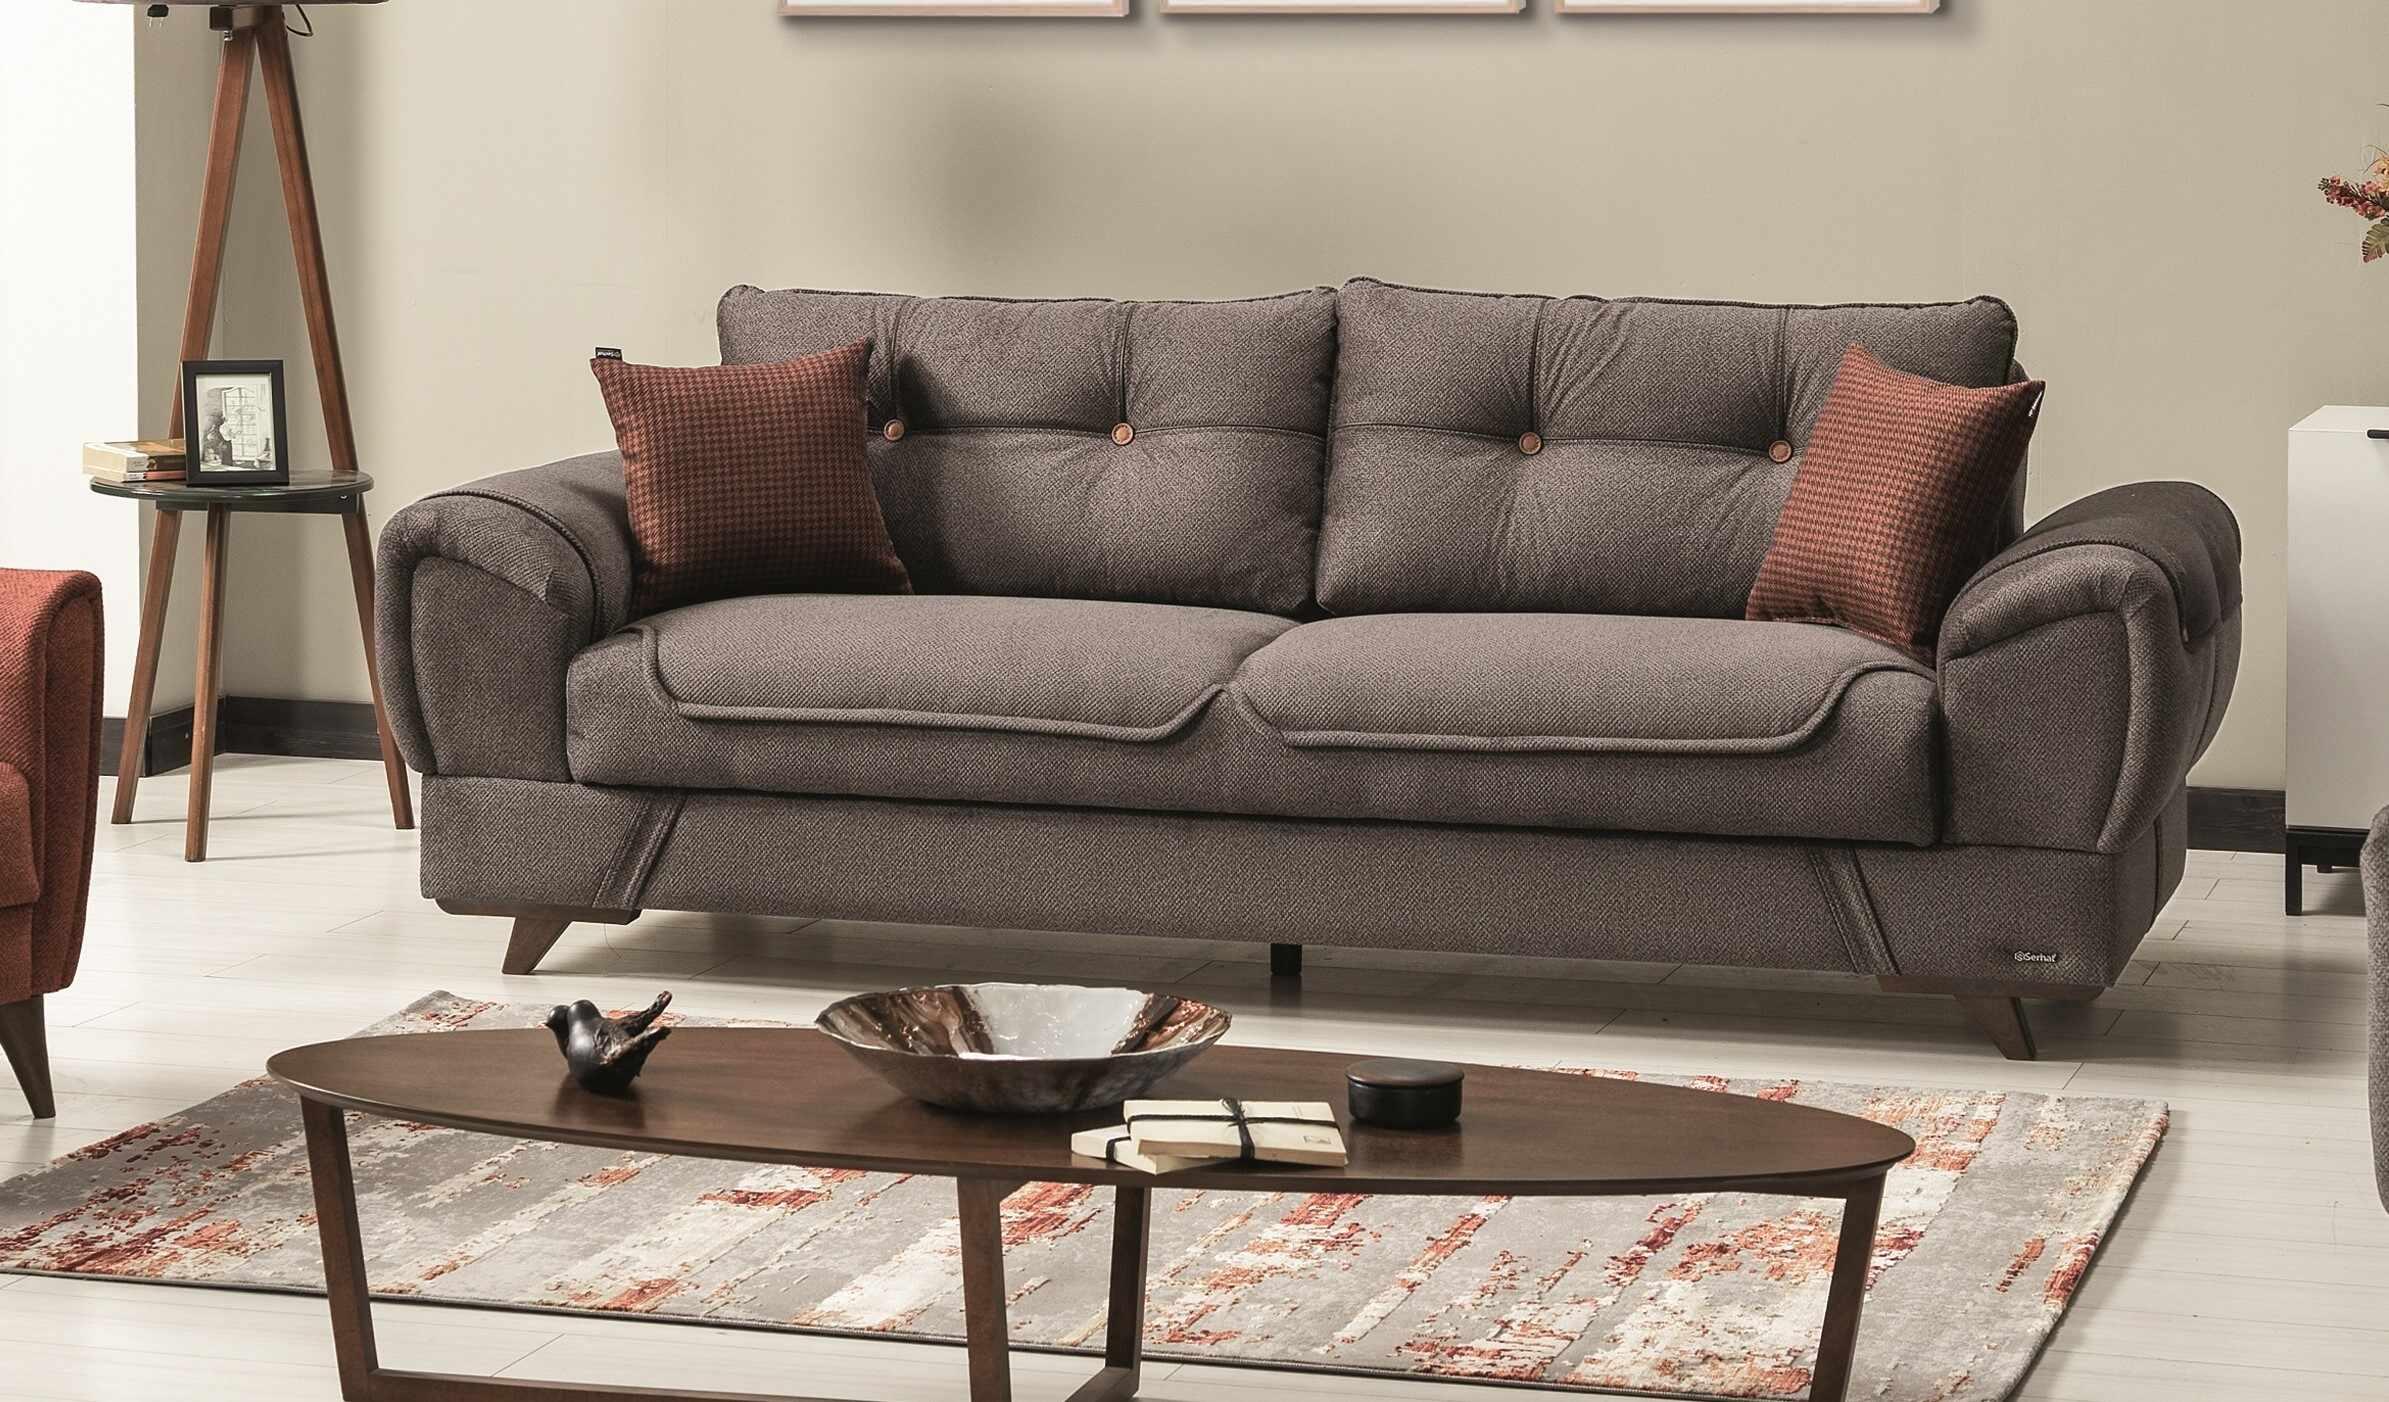 Canapea extensibila cu lada de depozitare, tapitata cu stofa si piele ecologica, 3 locuri Marla Gri K1, l254xA96xH85 cm la pret 2688 lei